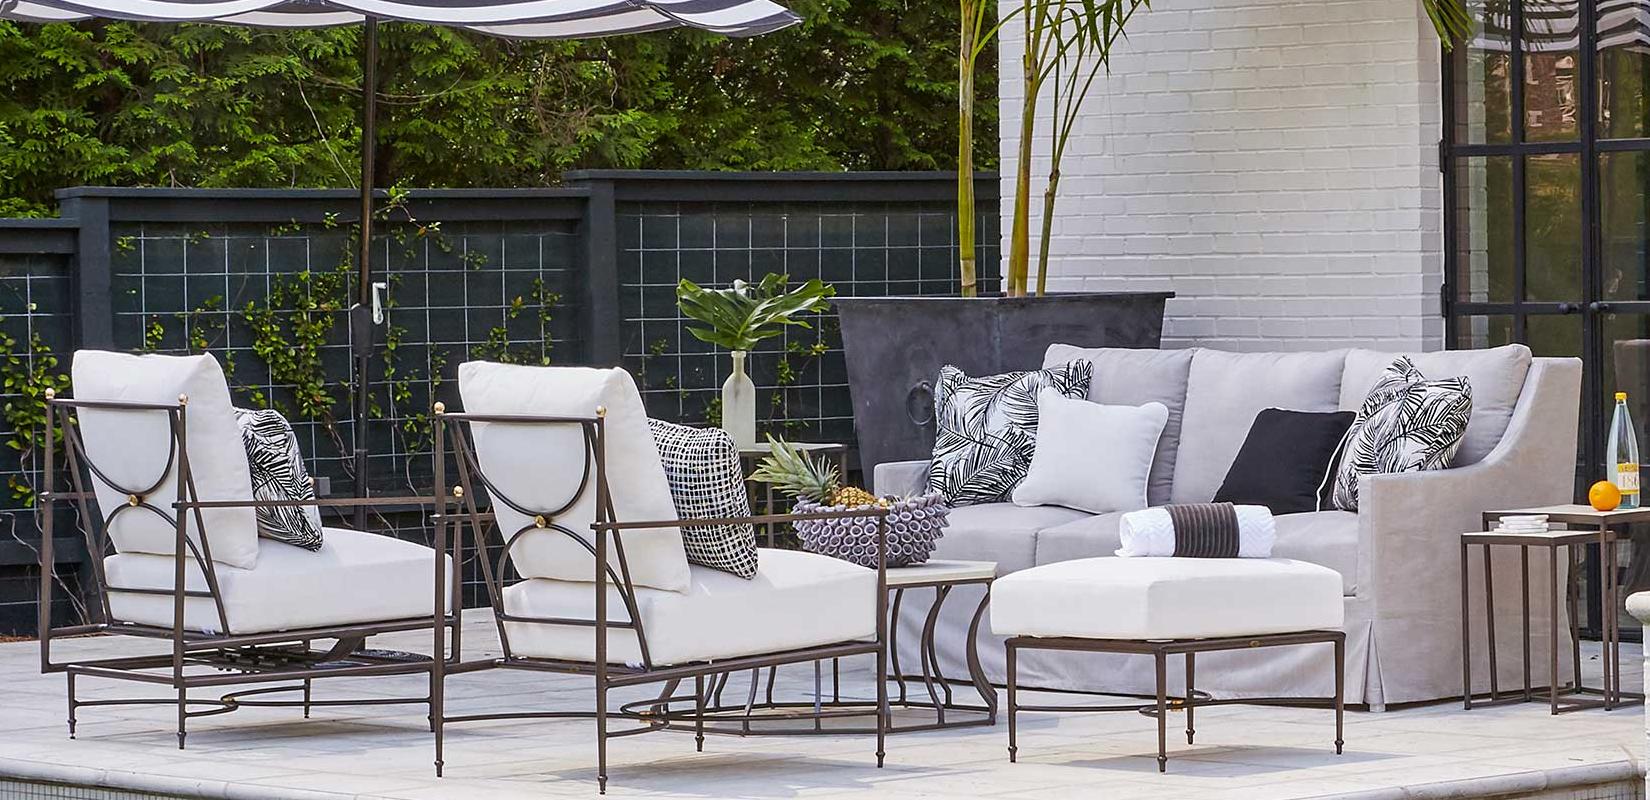 Roma outdoor furniture